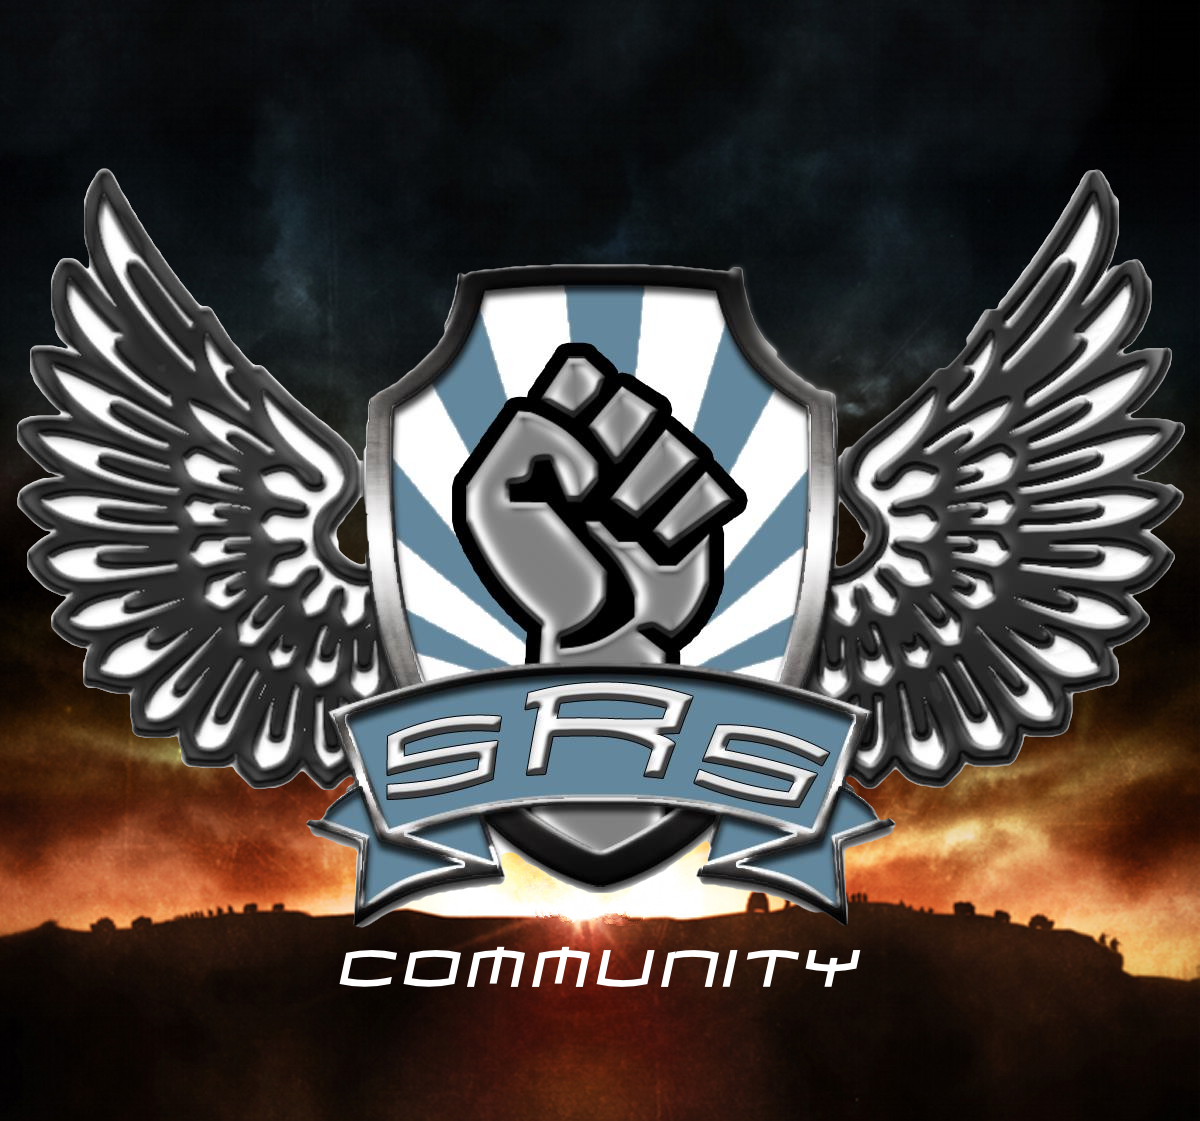 sRs community